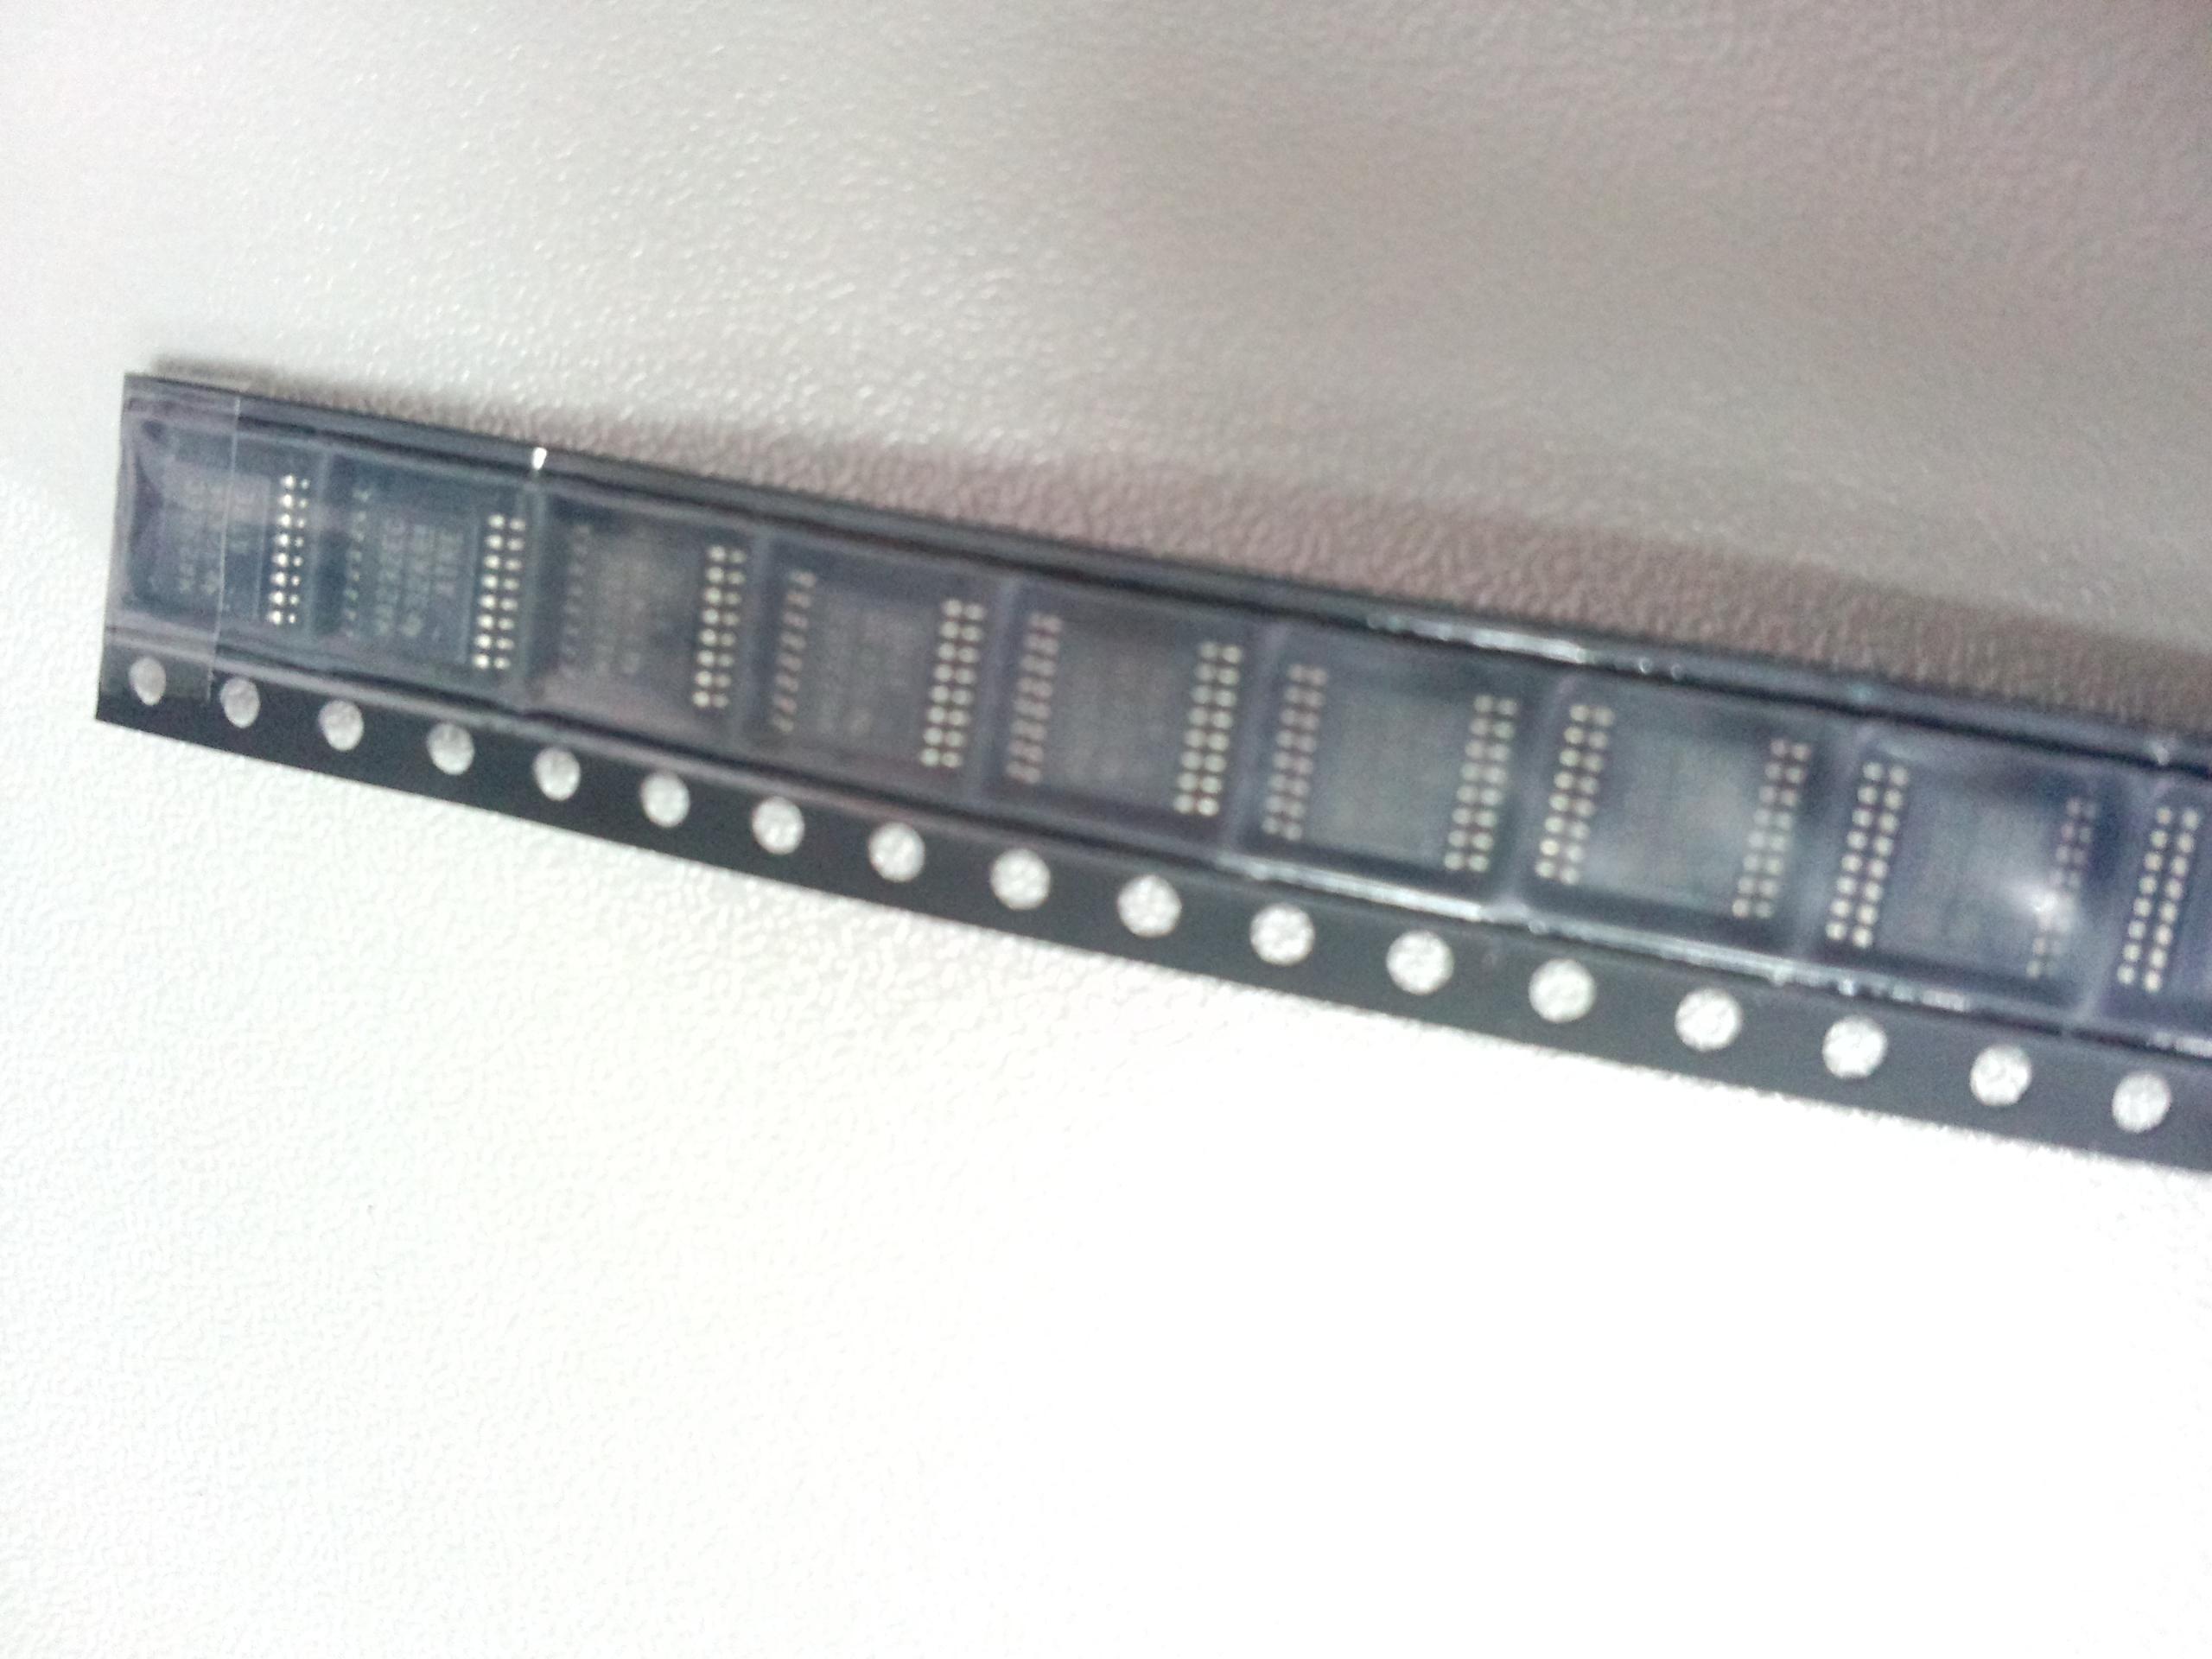 tirs-232接口集成电路 max232ecpwr